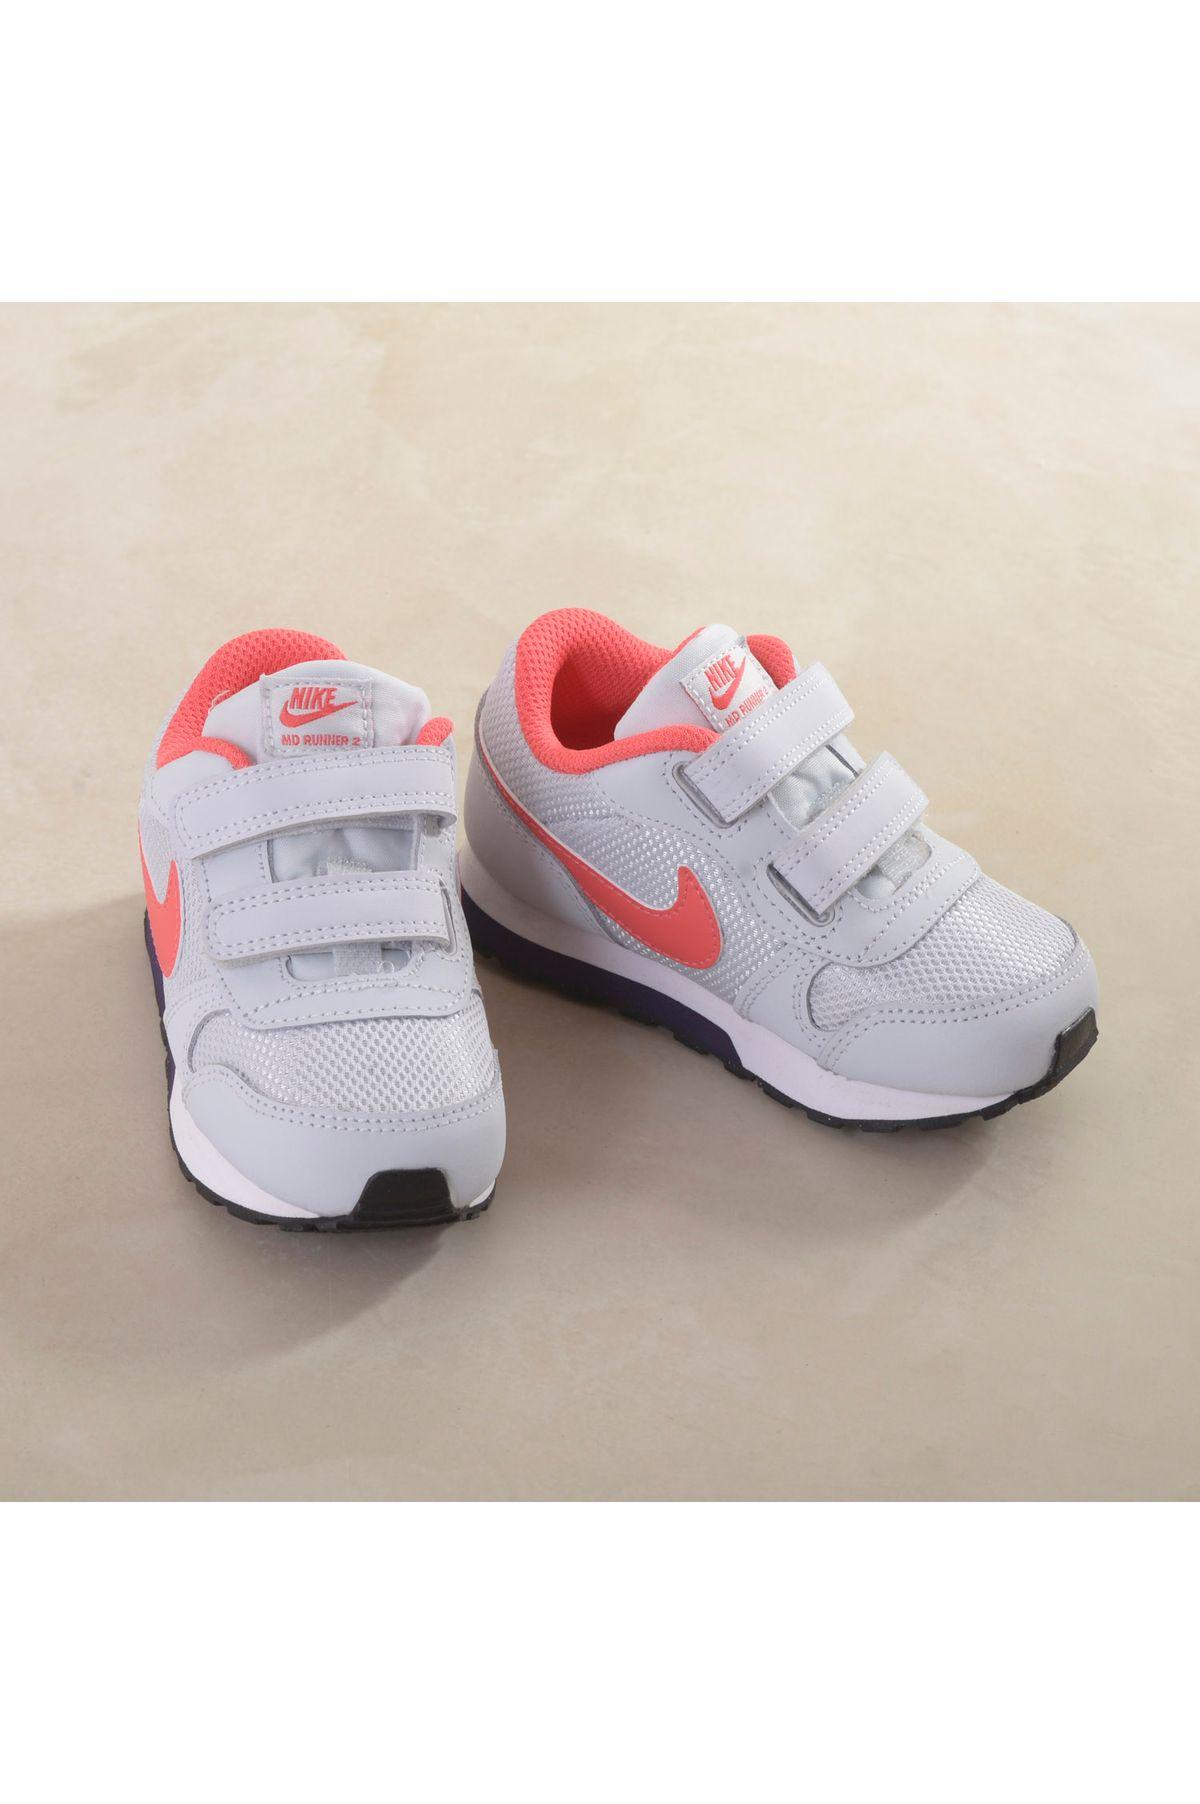 f92af9cba0814 Tênis Infantil Nike Md Runner 2 | Mundial Calçados - Mundial Calçados